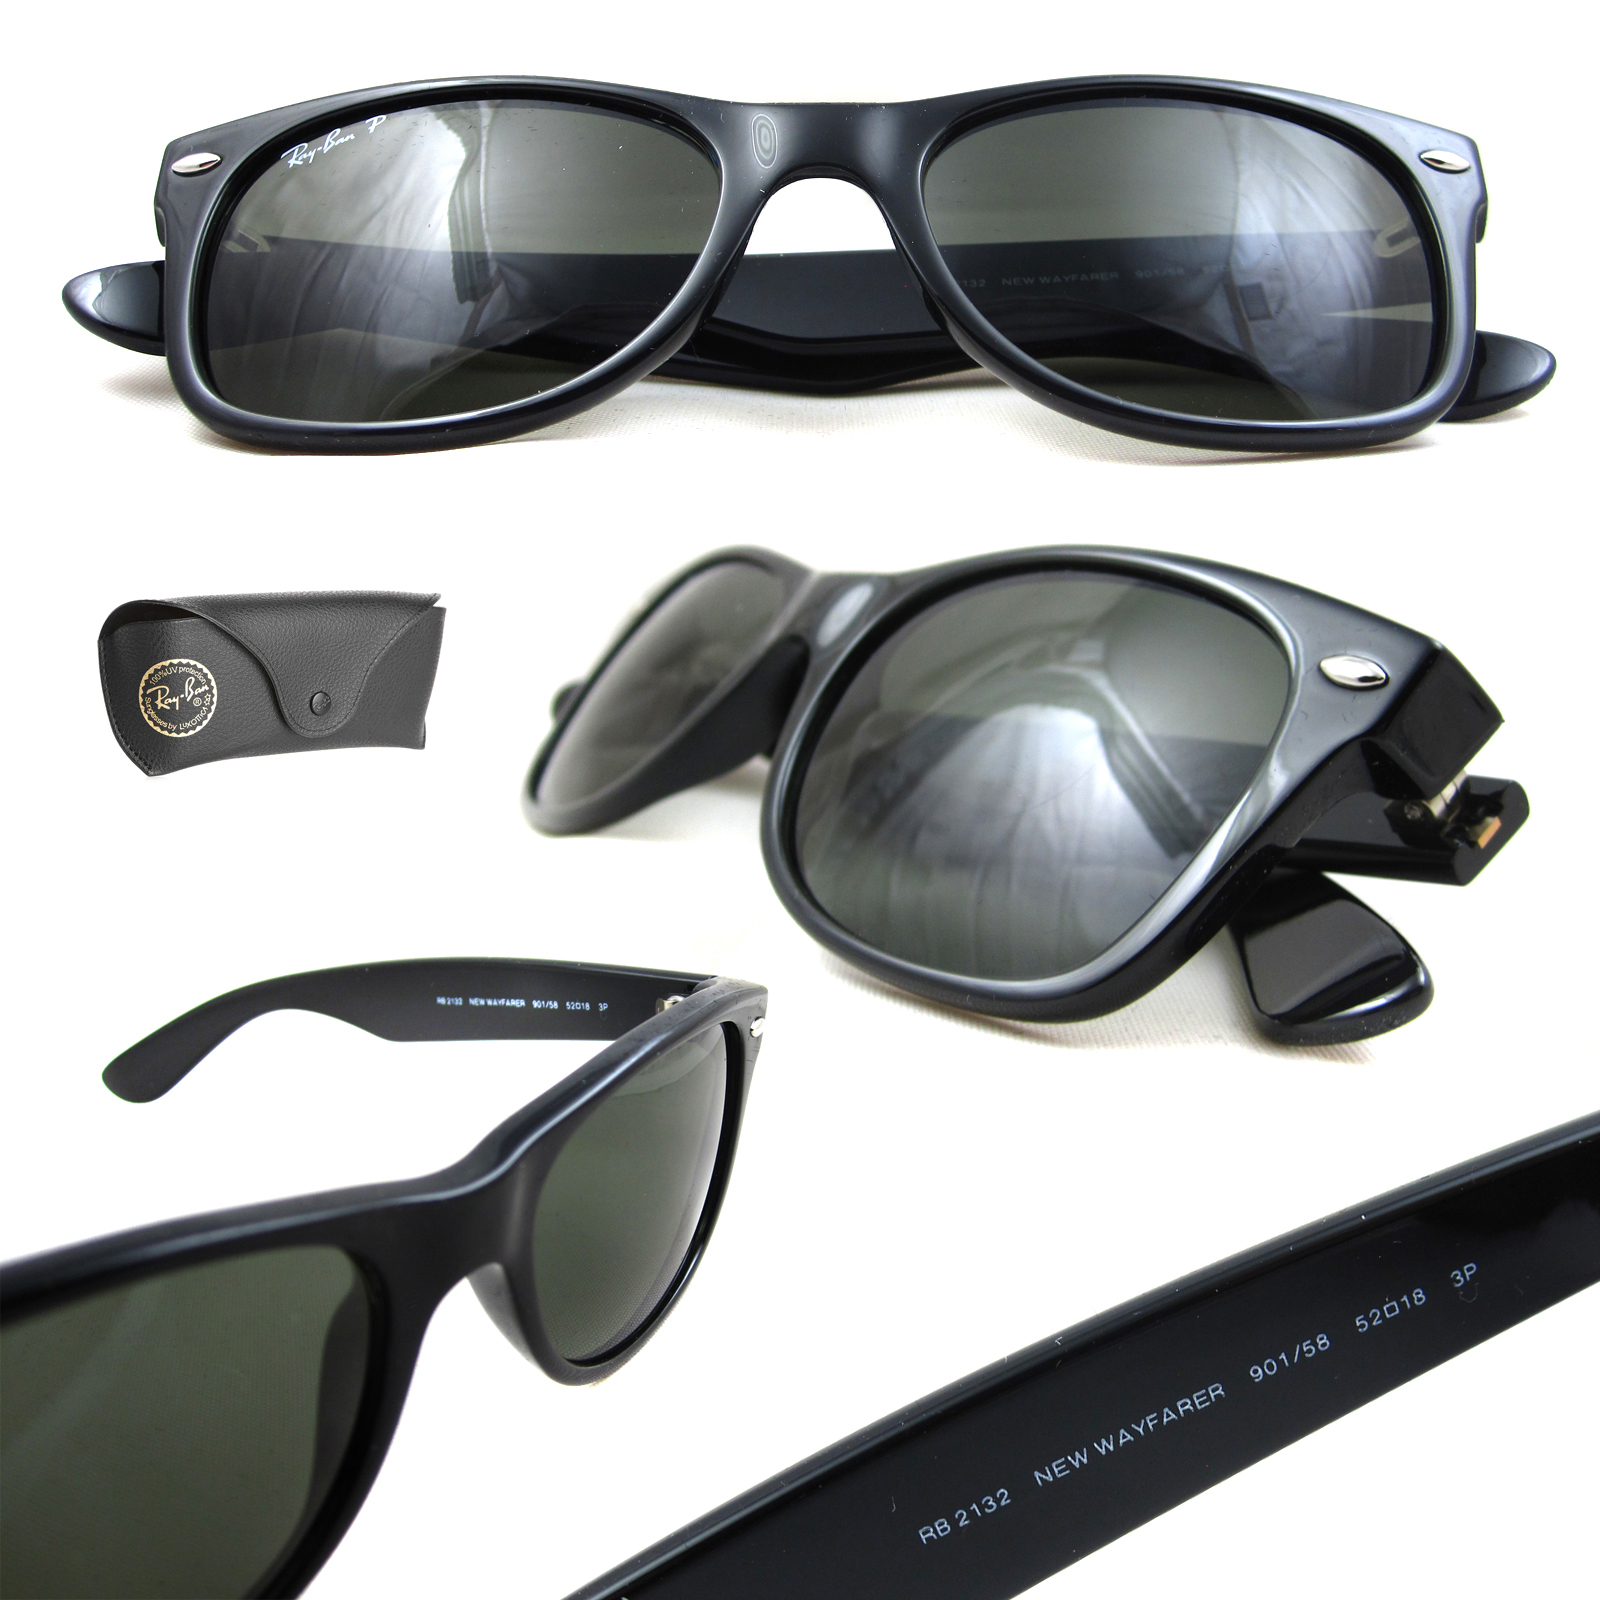 e0671173815 Sentinel Ray-Ban Sunglasses New Wayfarer 2132 901 58 Black Green G-15  Polarized